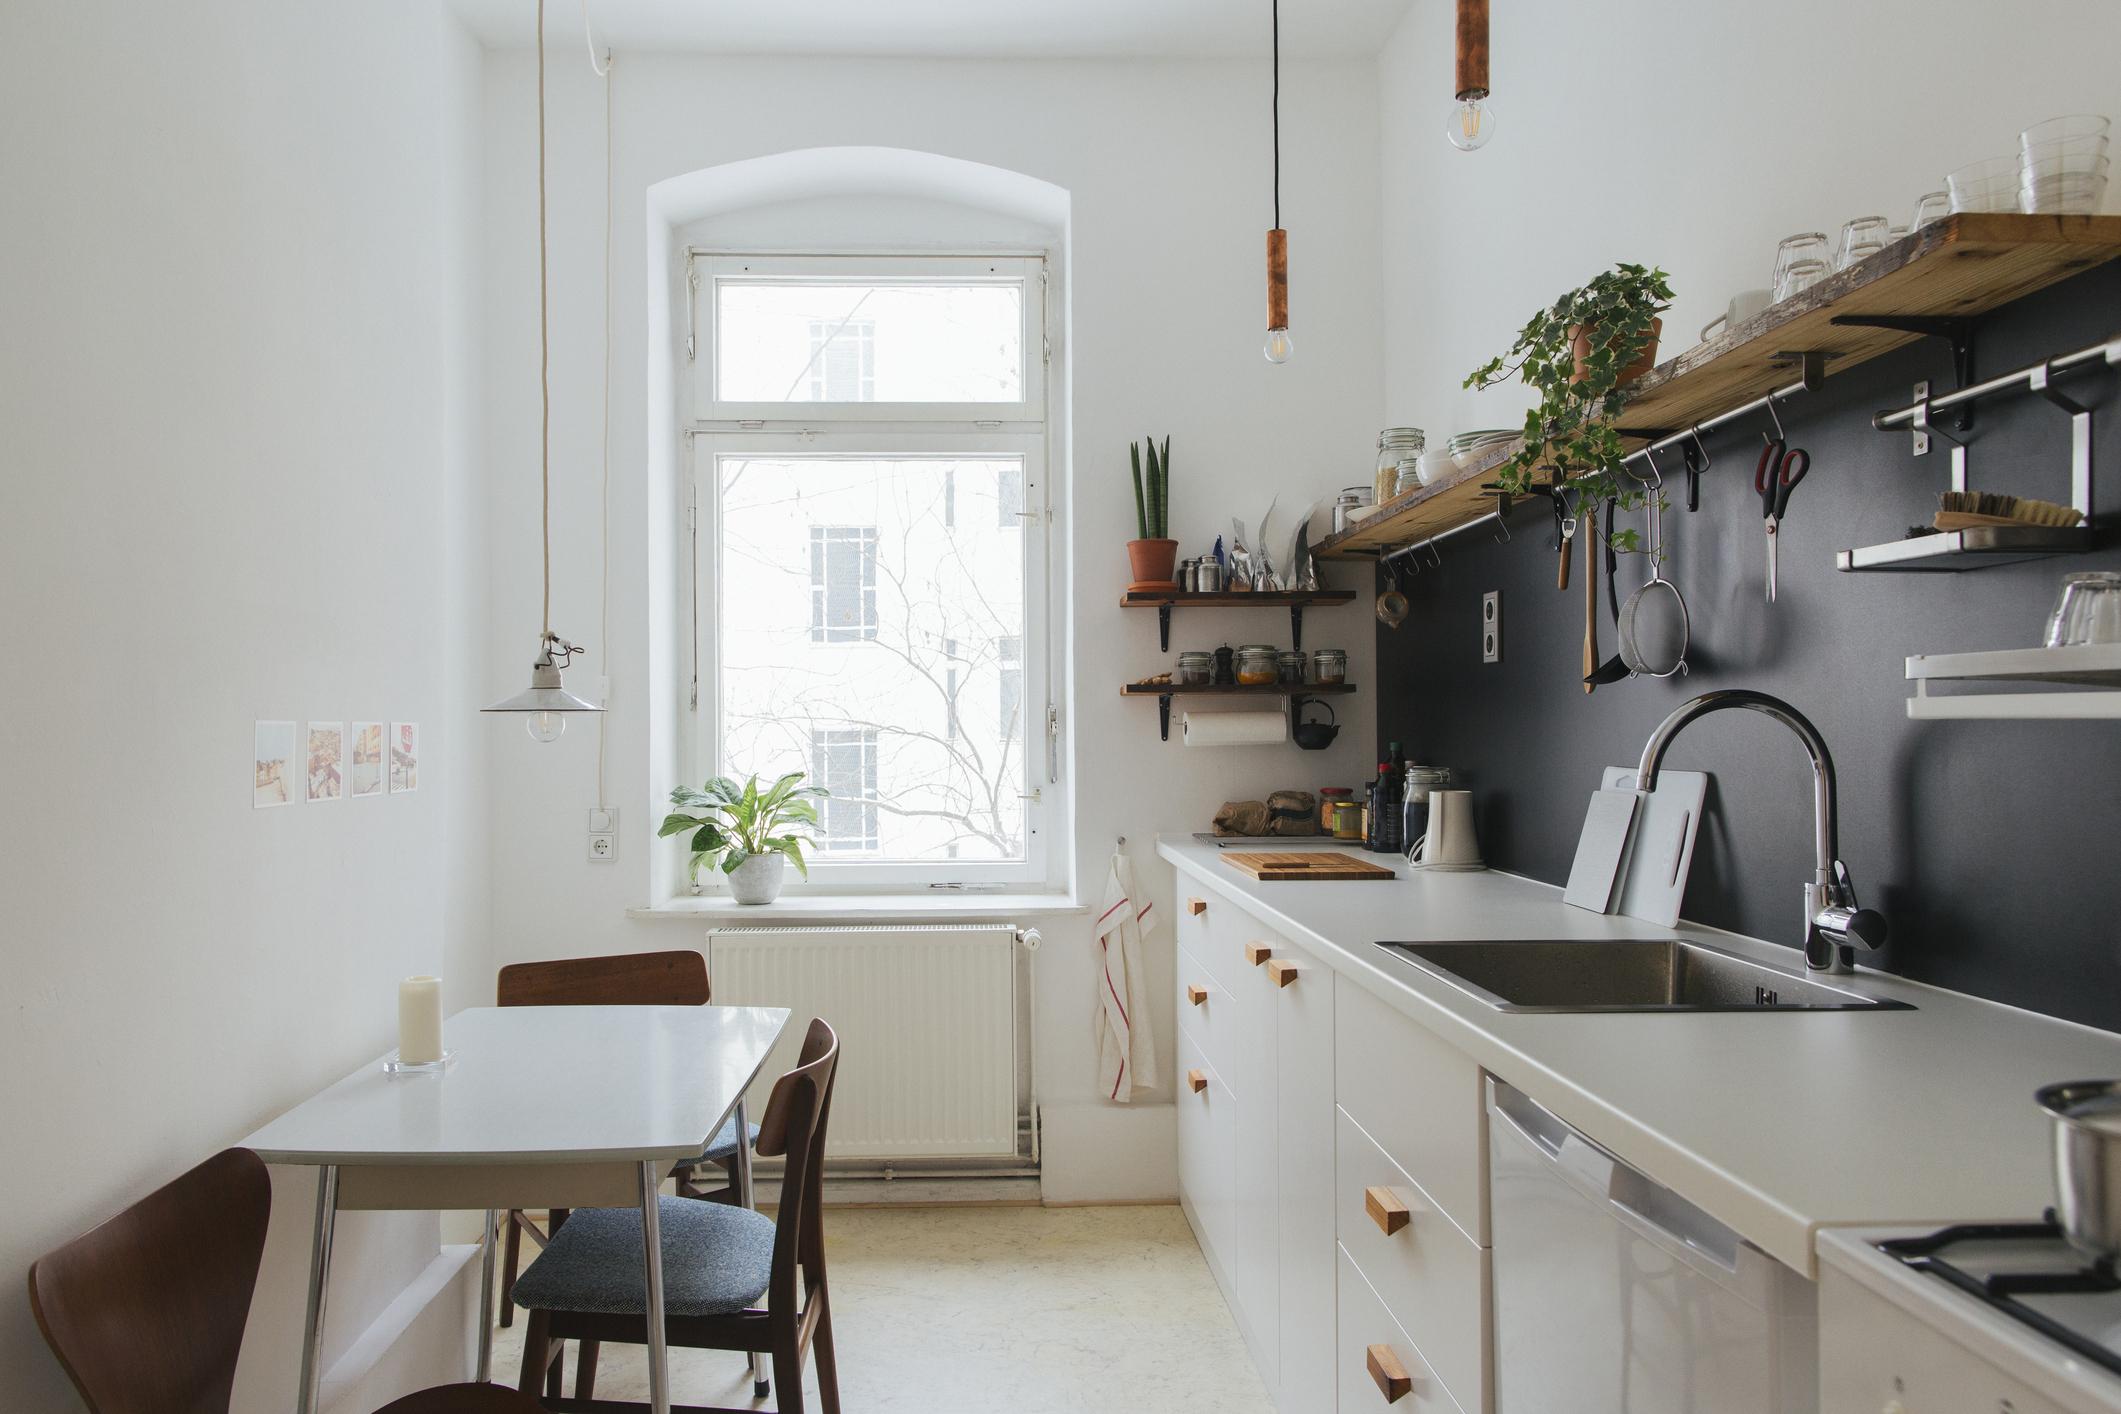 rendere la casa pi bella in 10 mosse